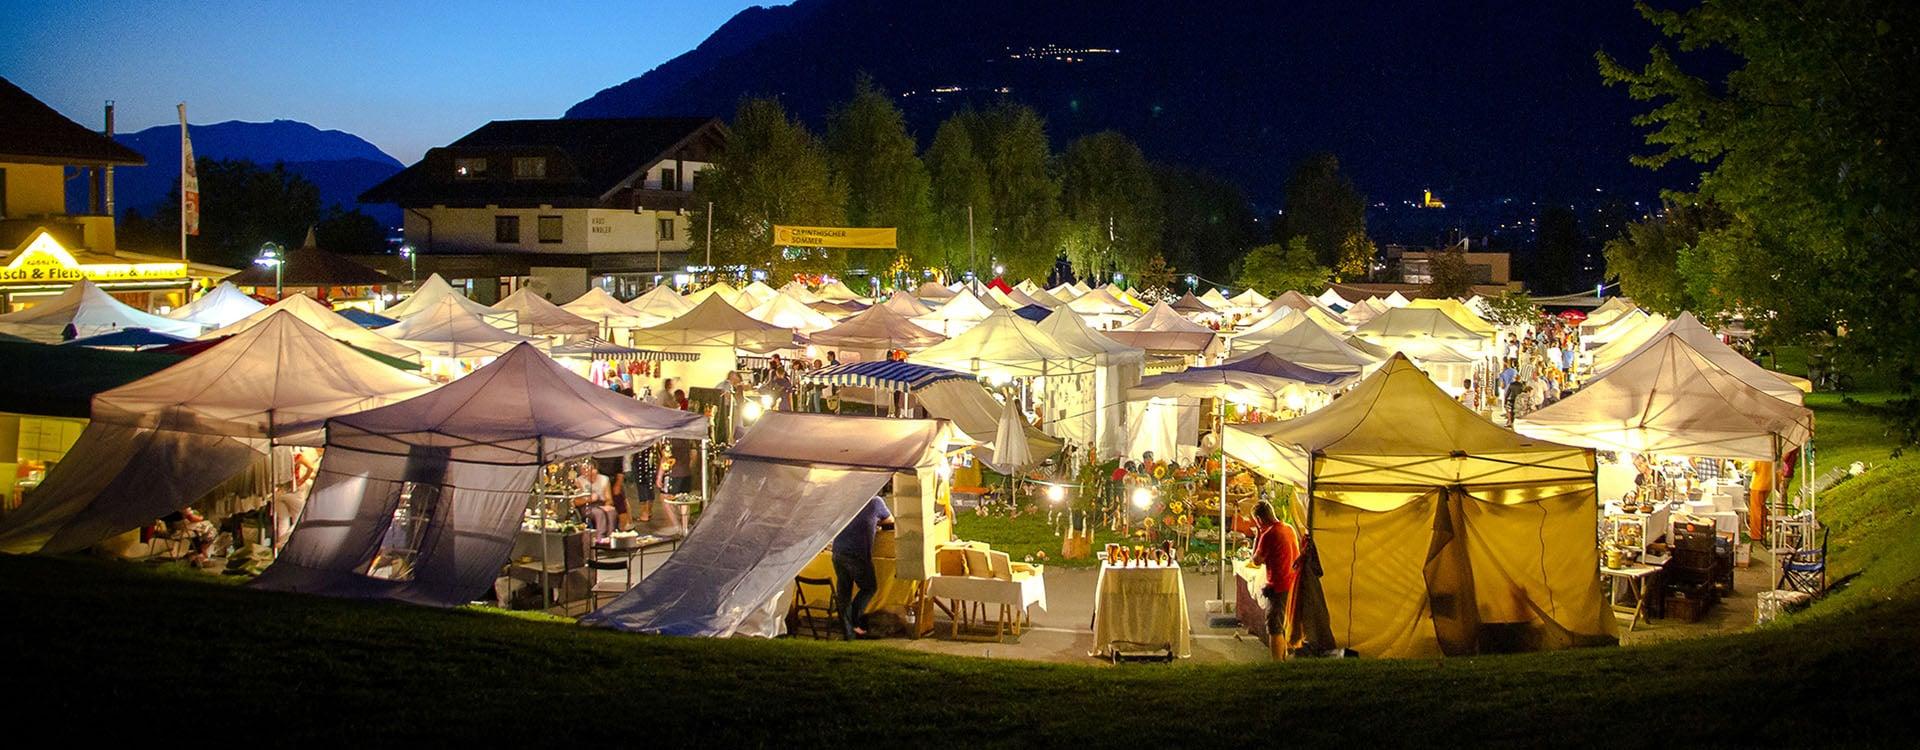 Kunsthandwerksmarkt Ossiach © Ossiachersee Insider